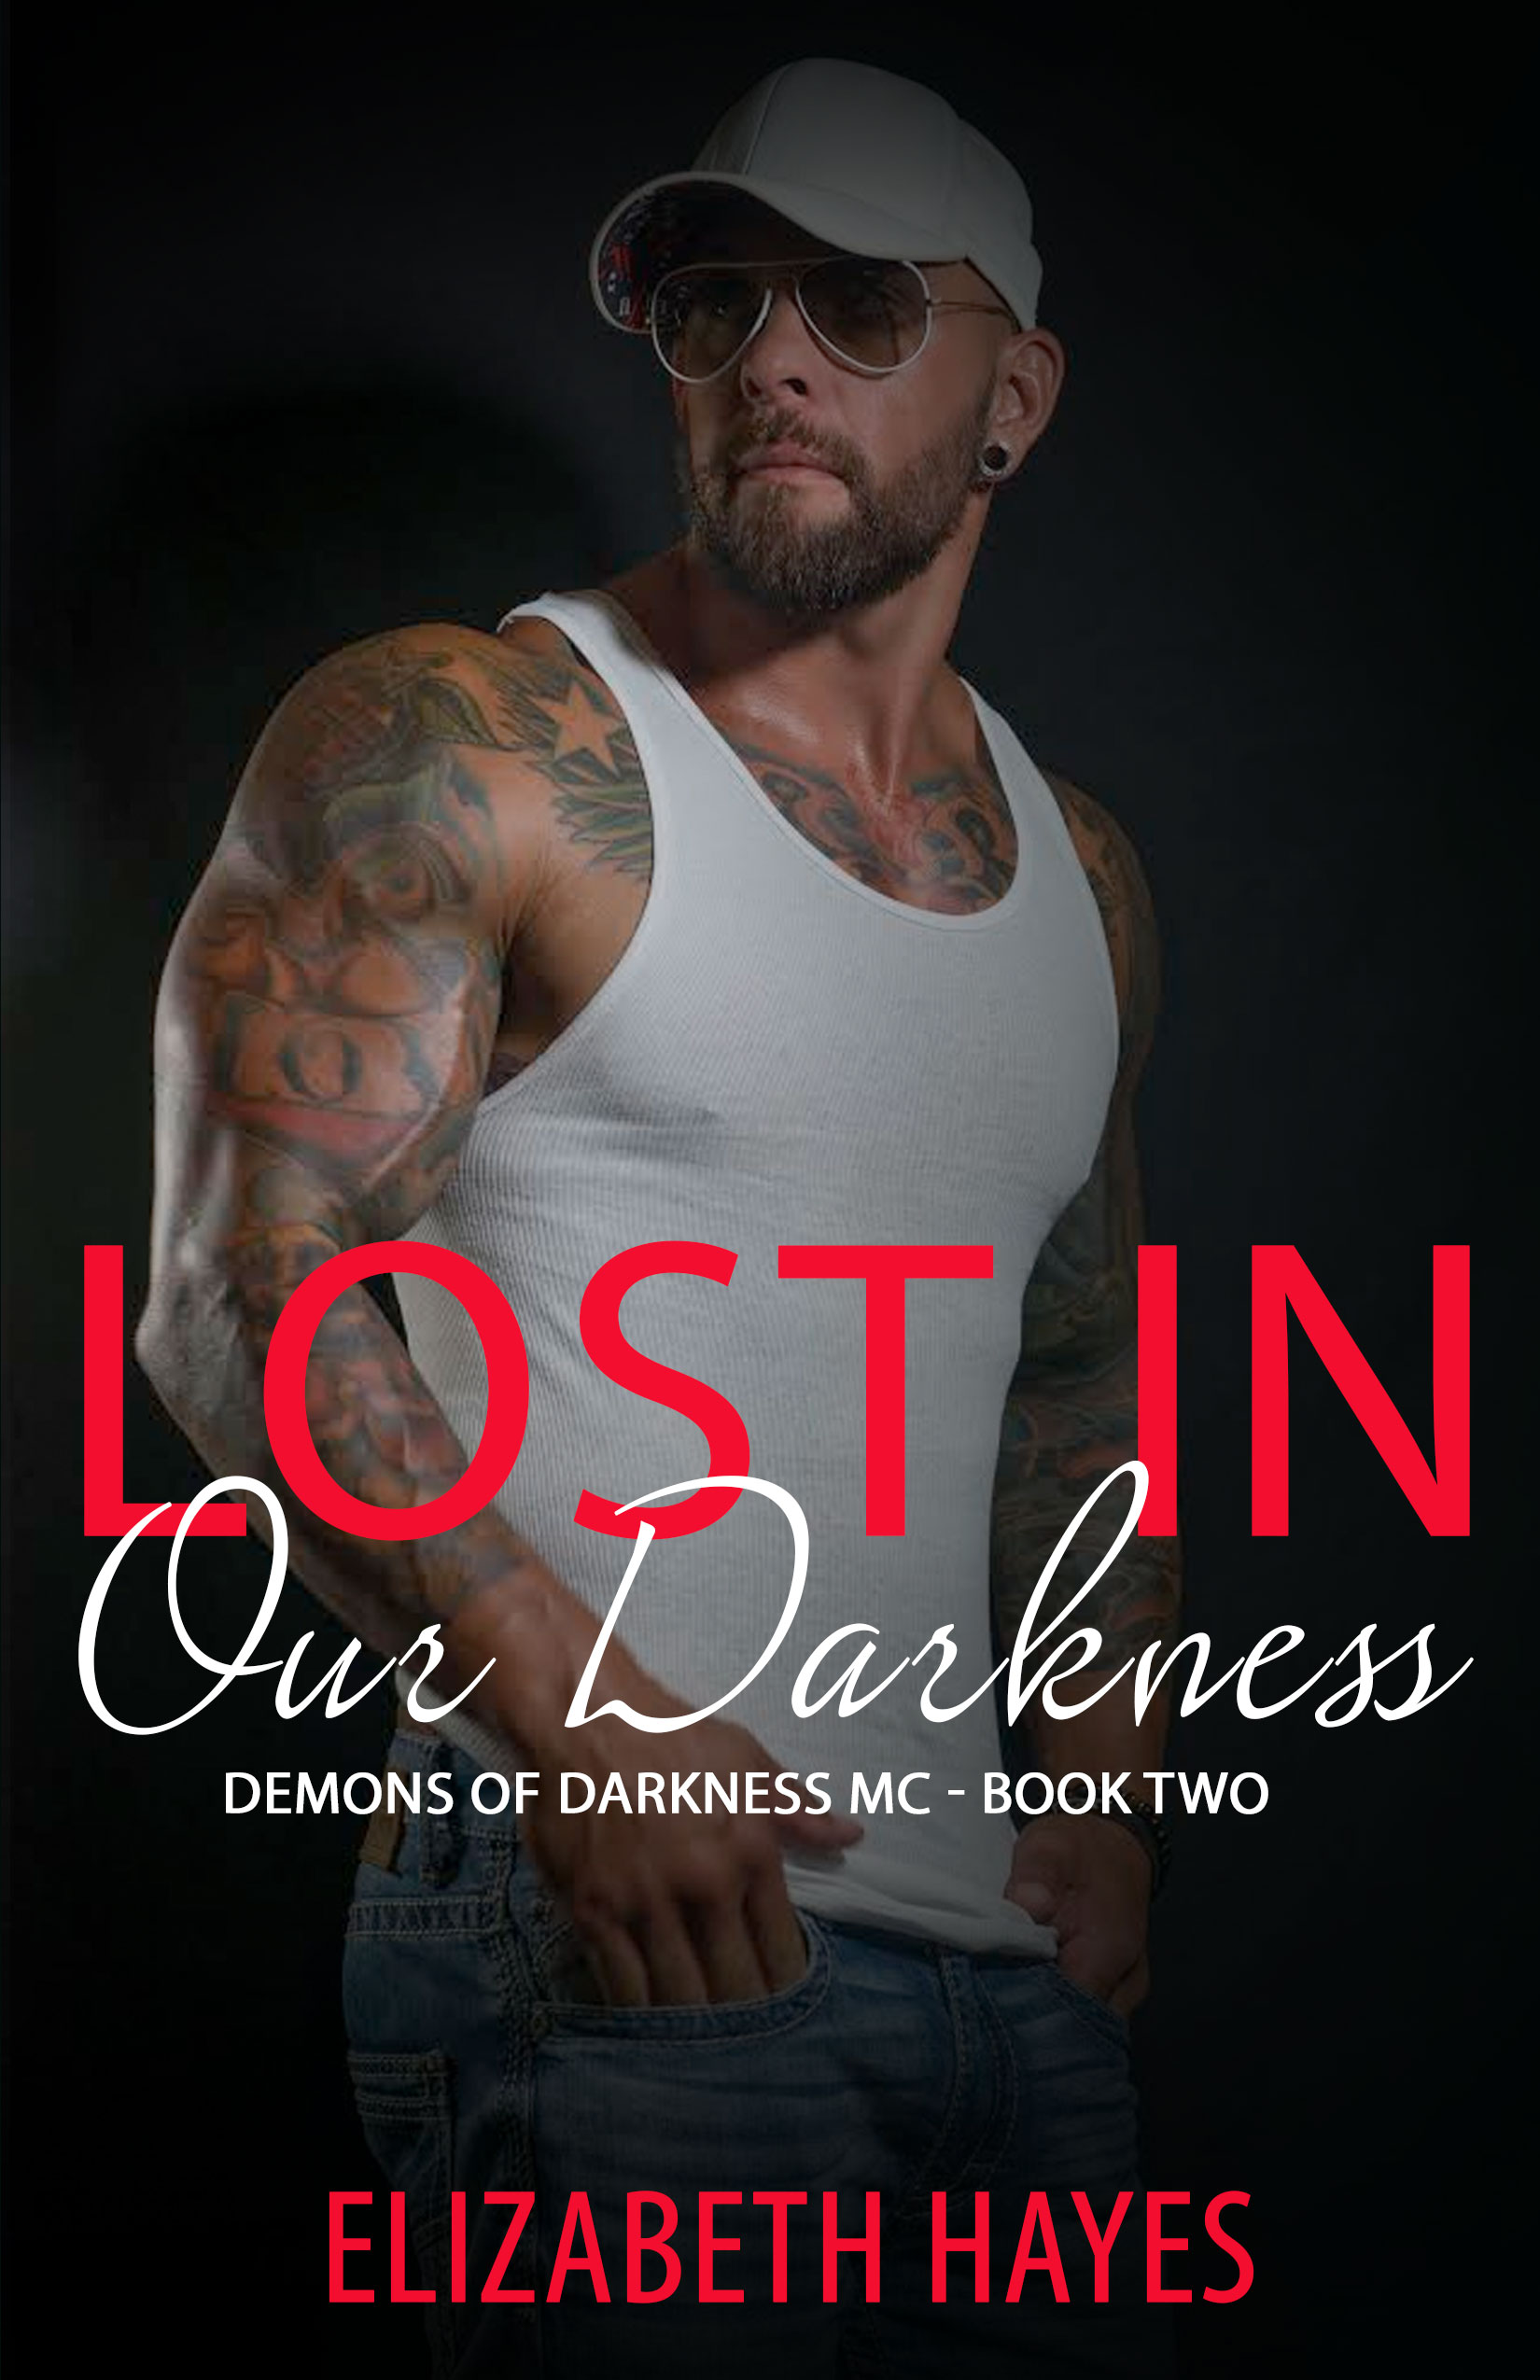 LostinOurDarknessFinaleBook